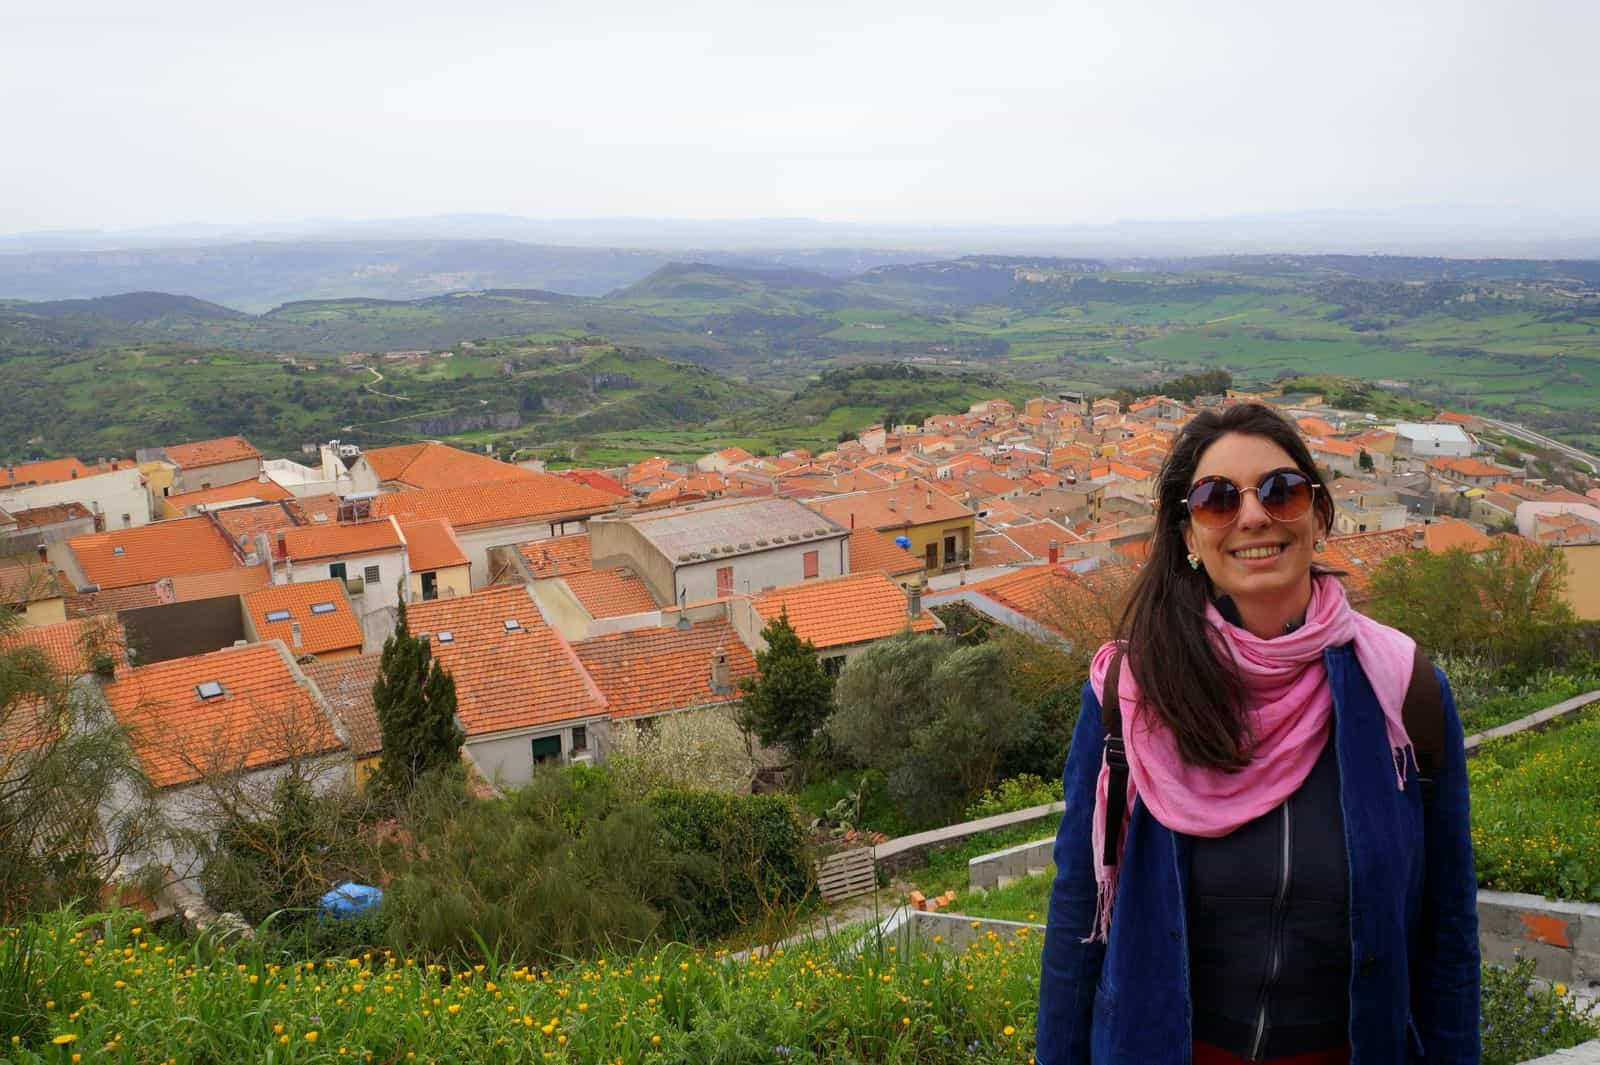 panorama_castello_medievale_osilo_malaspina